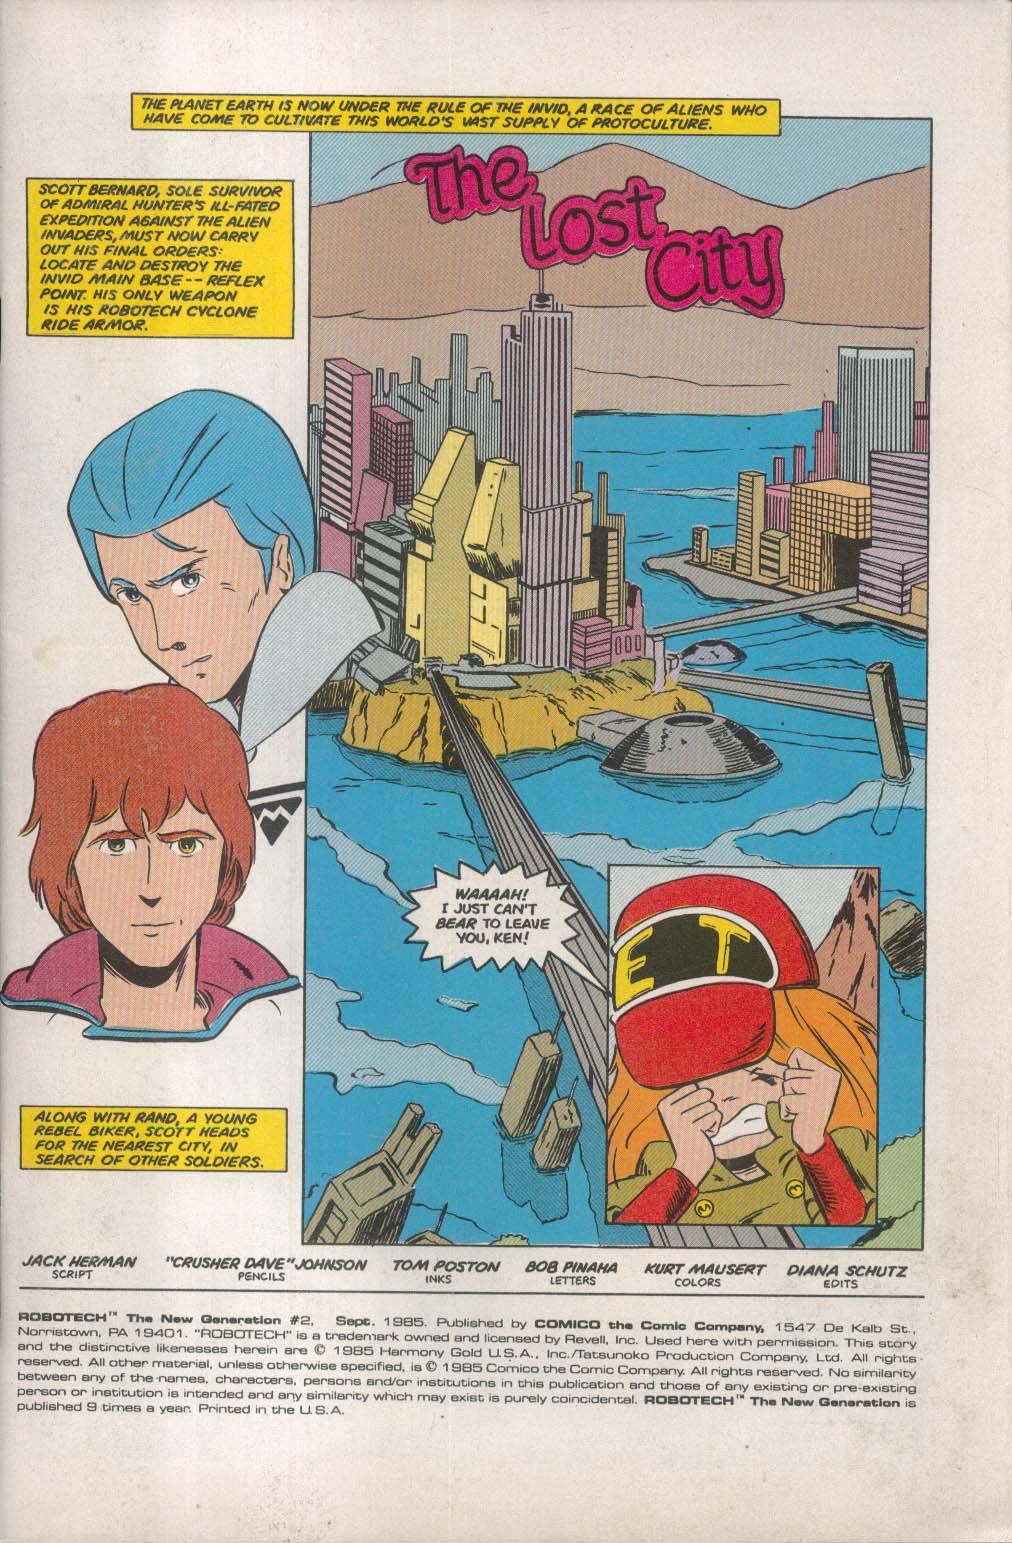 ROBOTECH New Generation #2 Comico comic book 9 1985